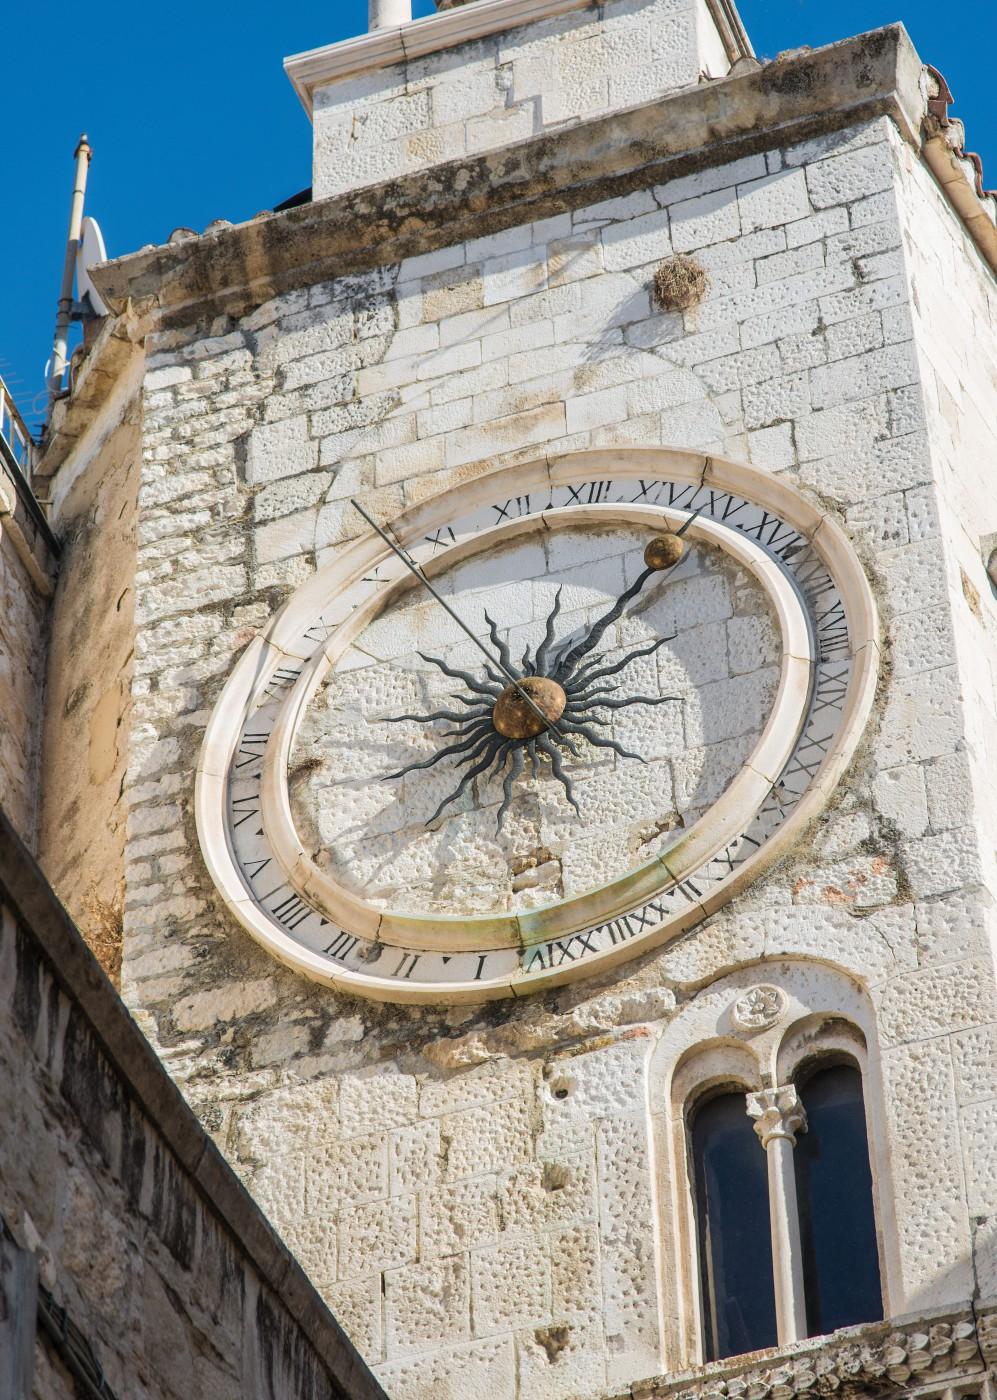 John Drajewicz, </span><span><em>Slip Town Clock</em>, </span><span>2017